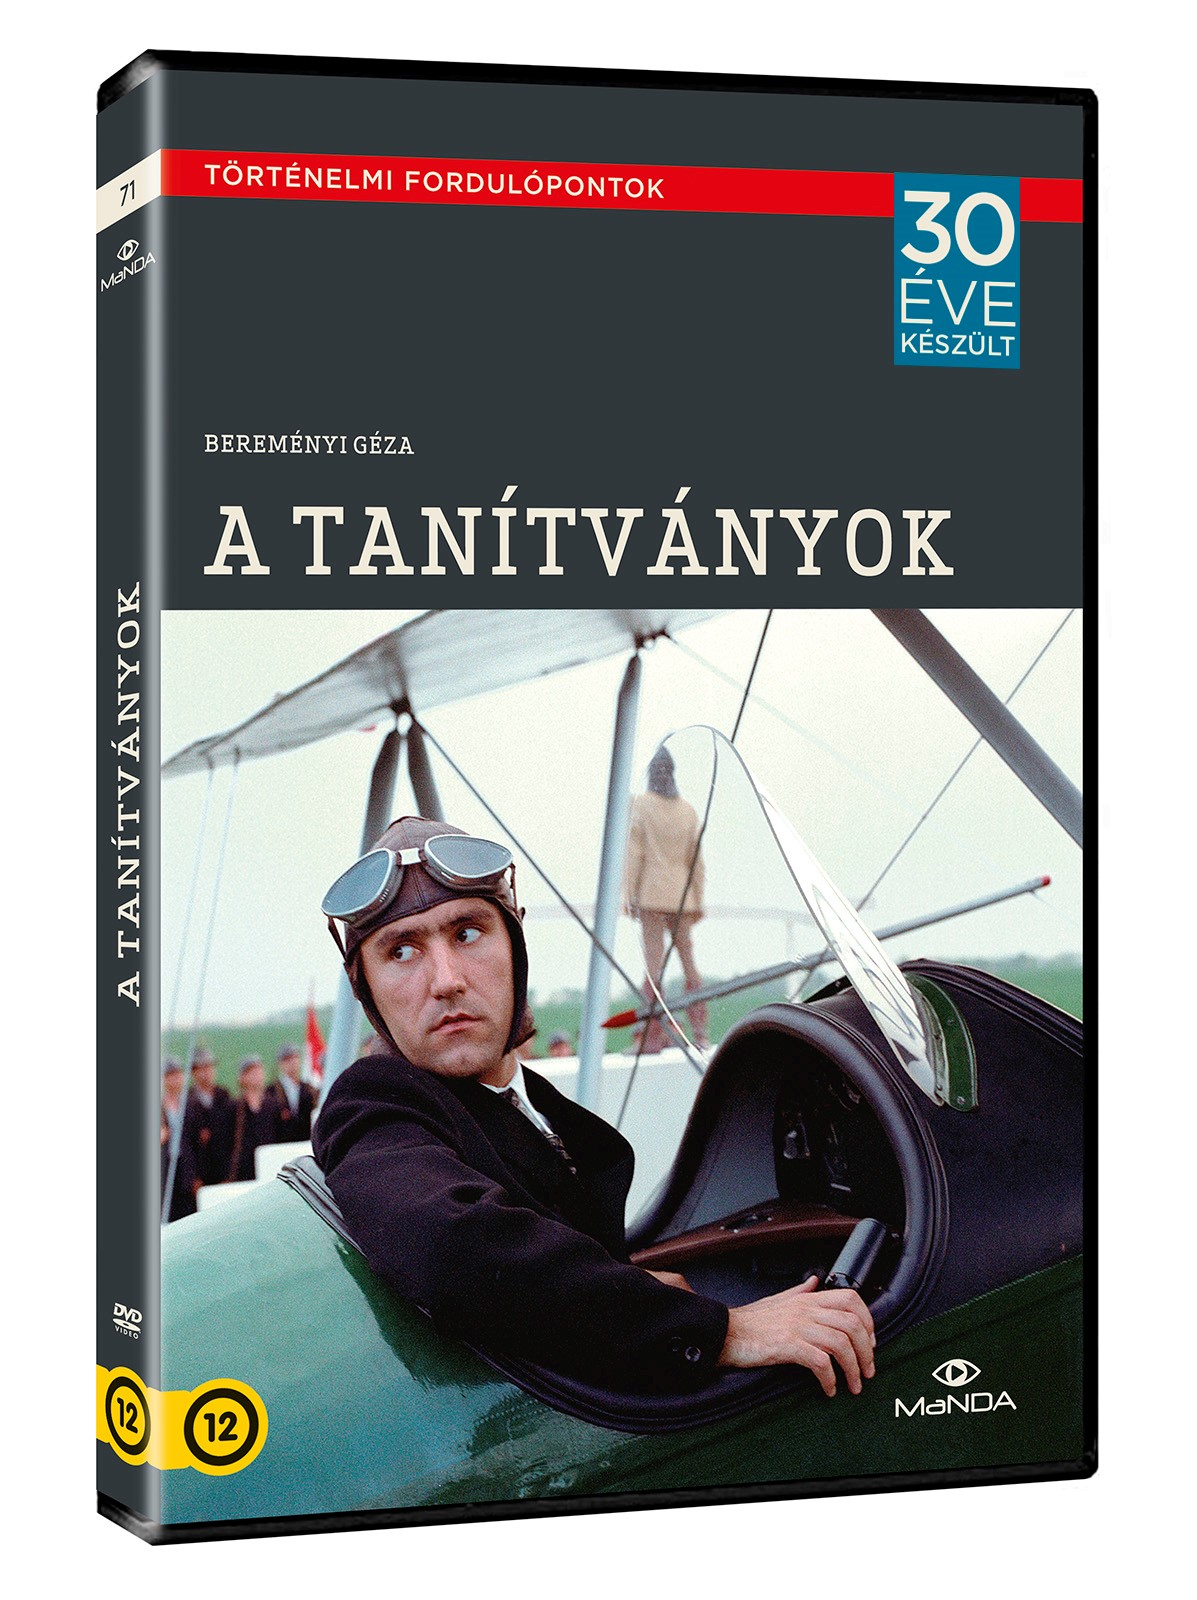 tanitvanyok_3D